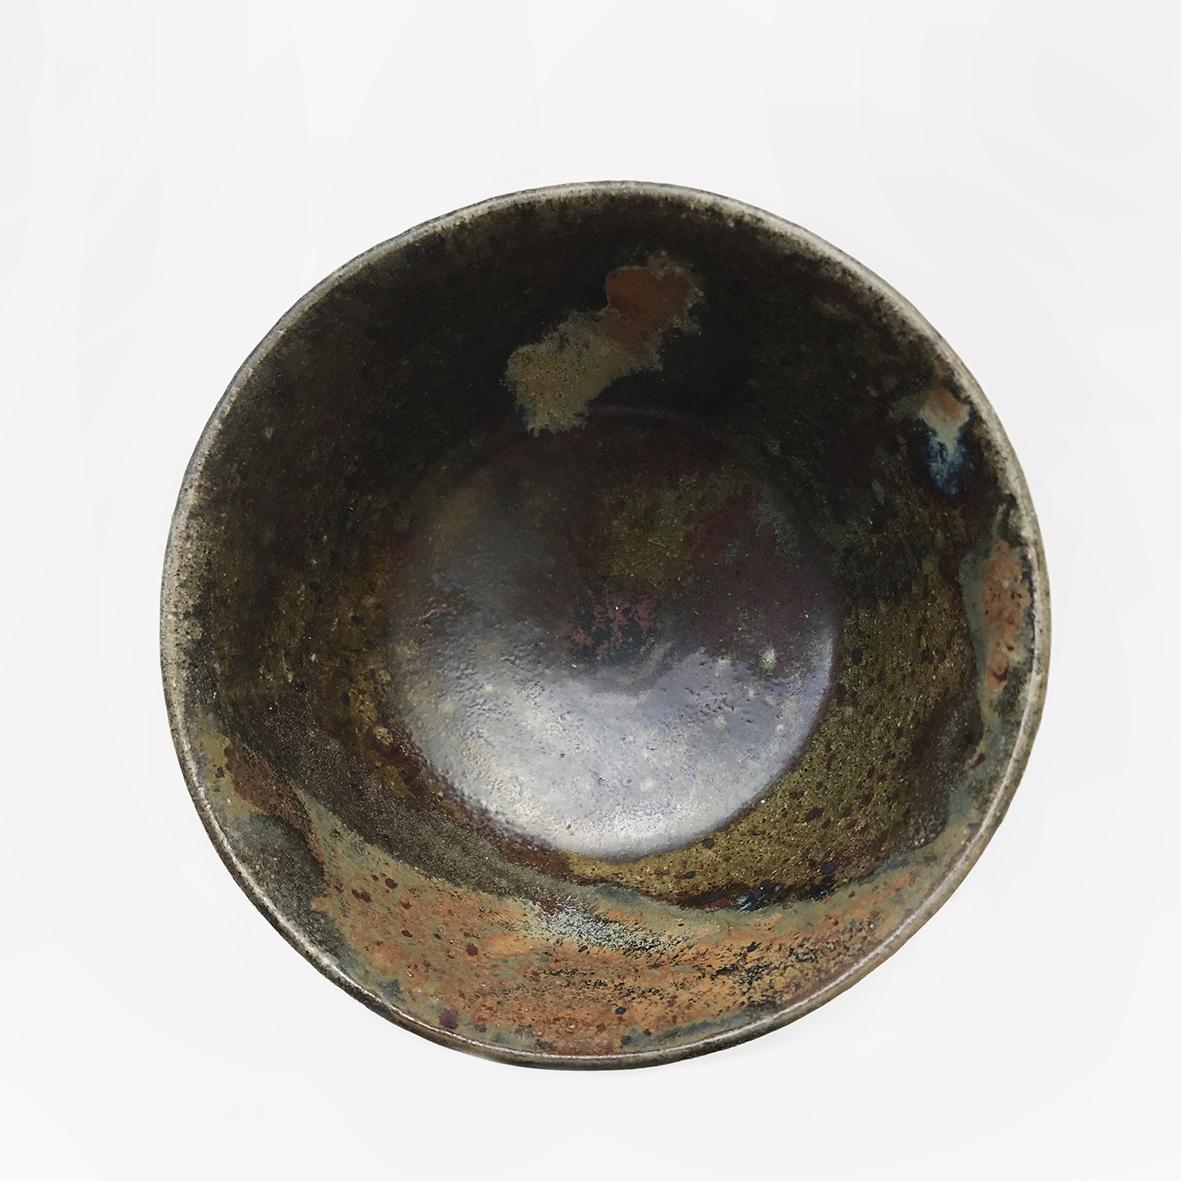 Shawan | Shoji Hamada | Ceramic | Mashiko, Japan | before 1940 | basedonart gallery